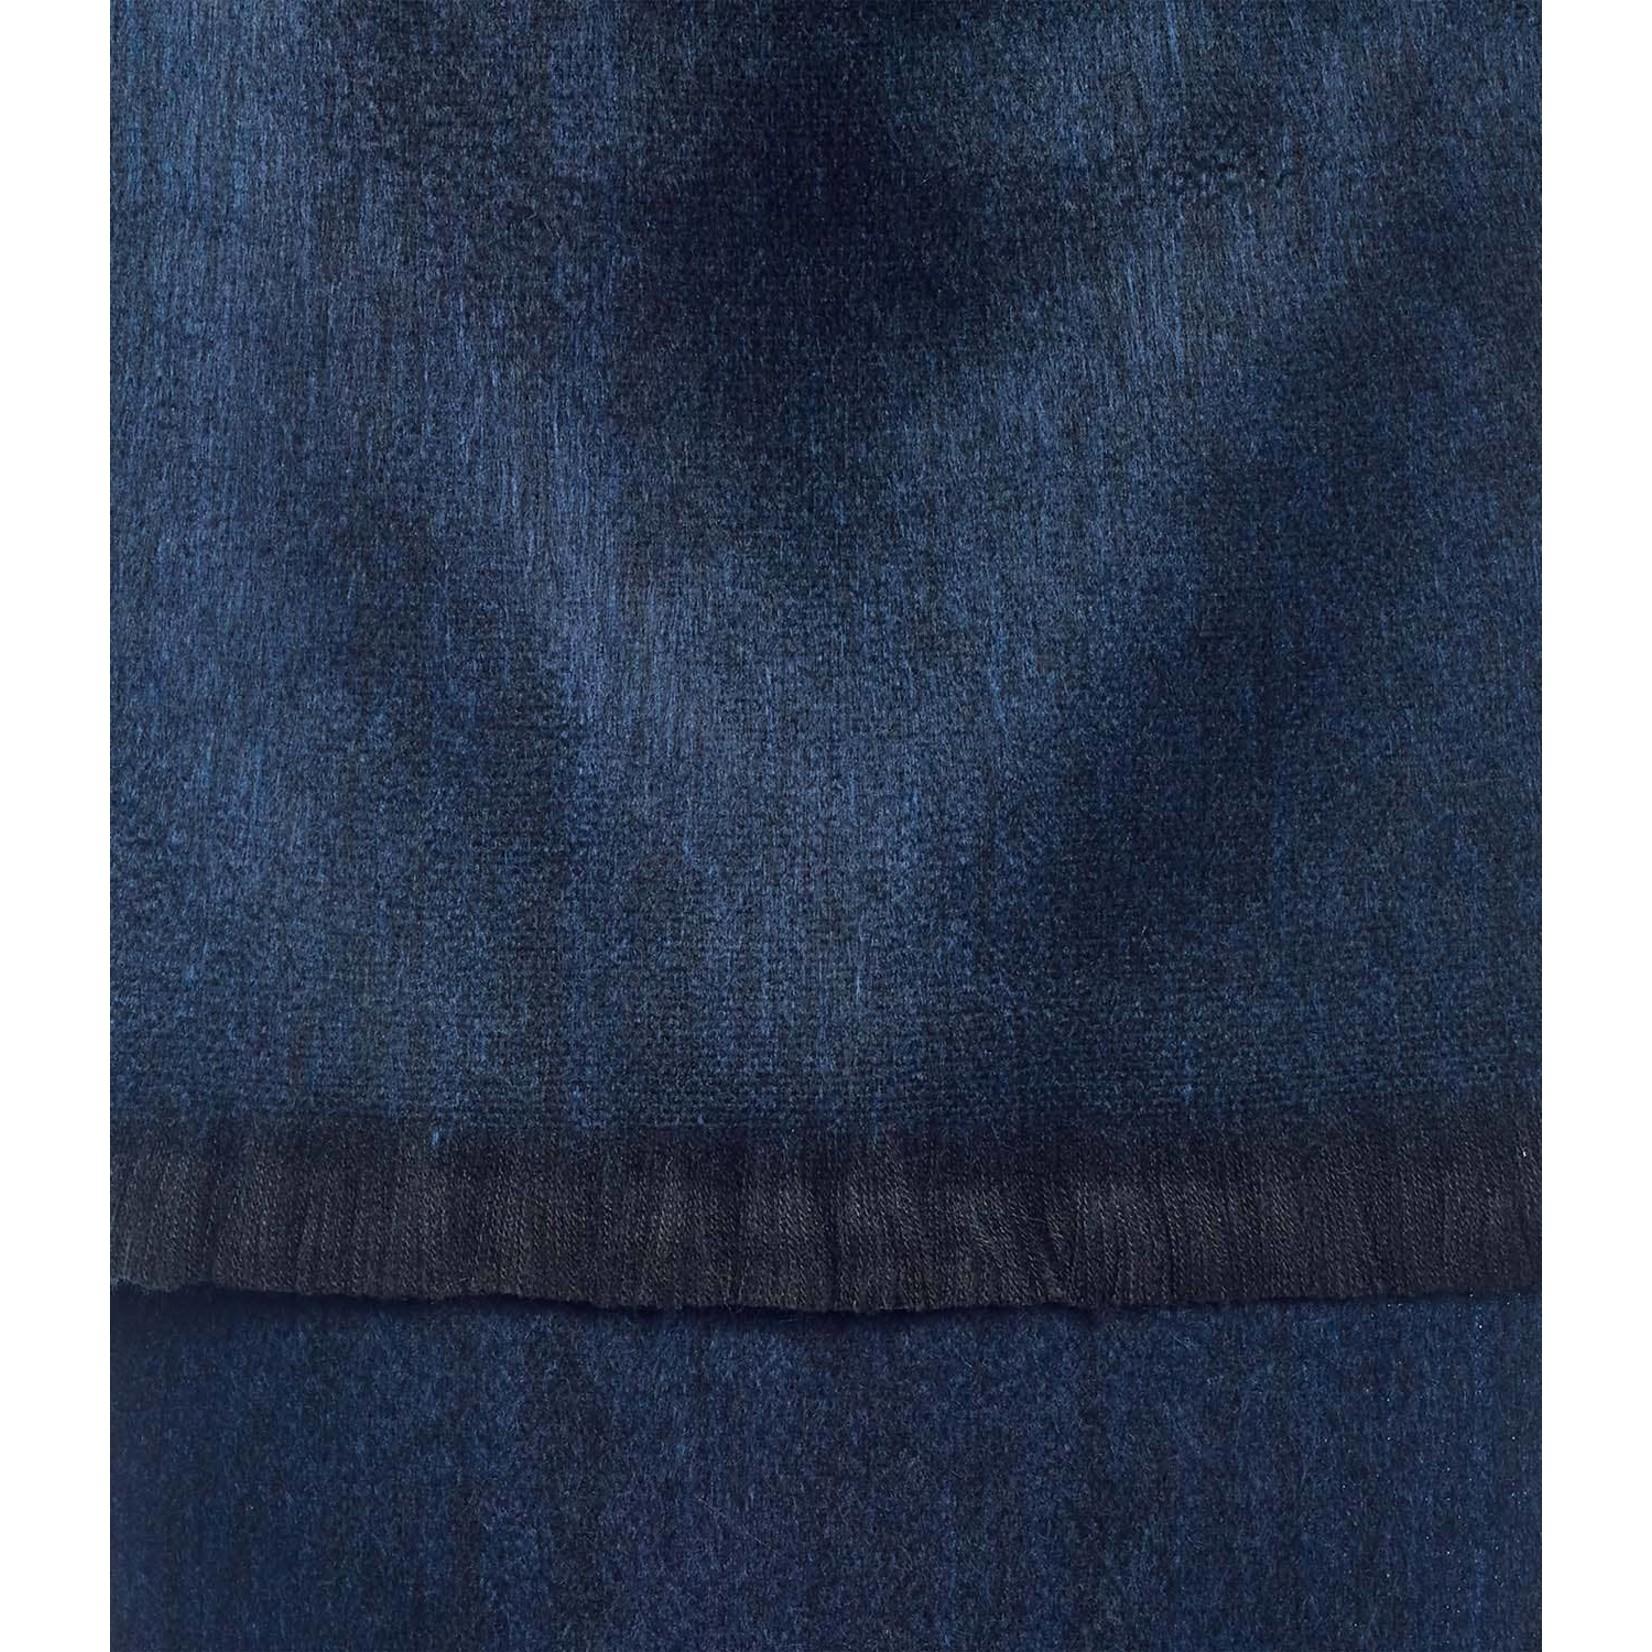 Alpaca Scarf in Moonlight Blue